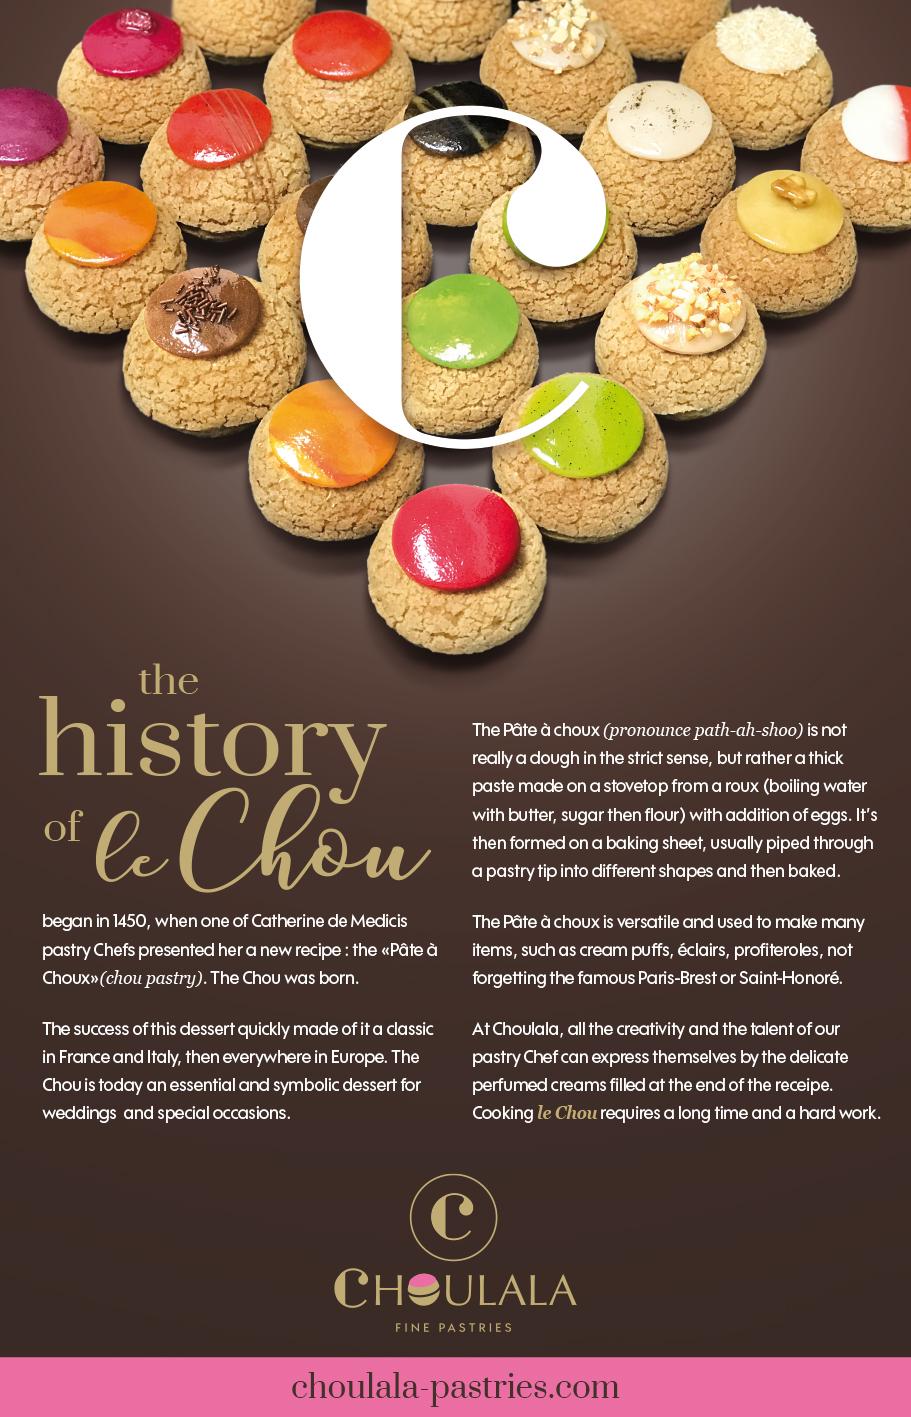 Affiche Choulala par Pesto Studio